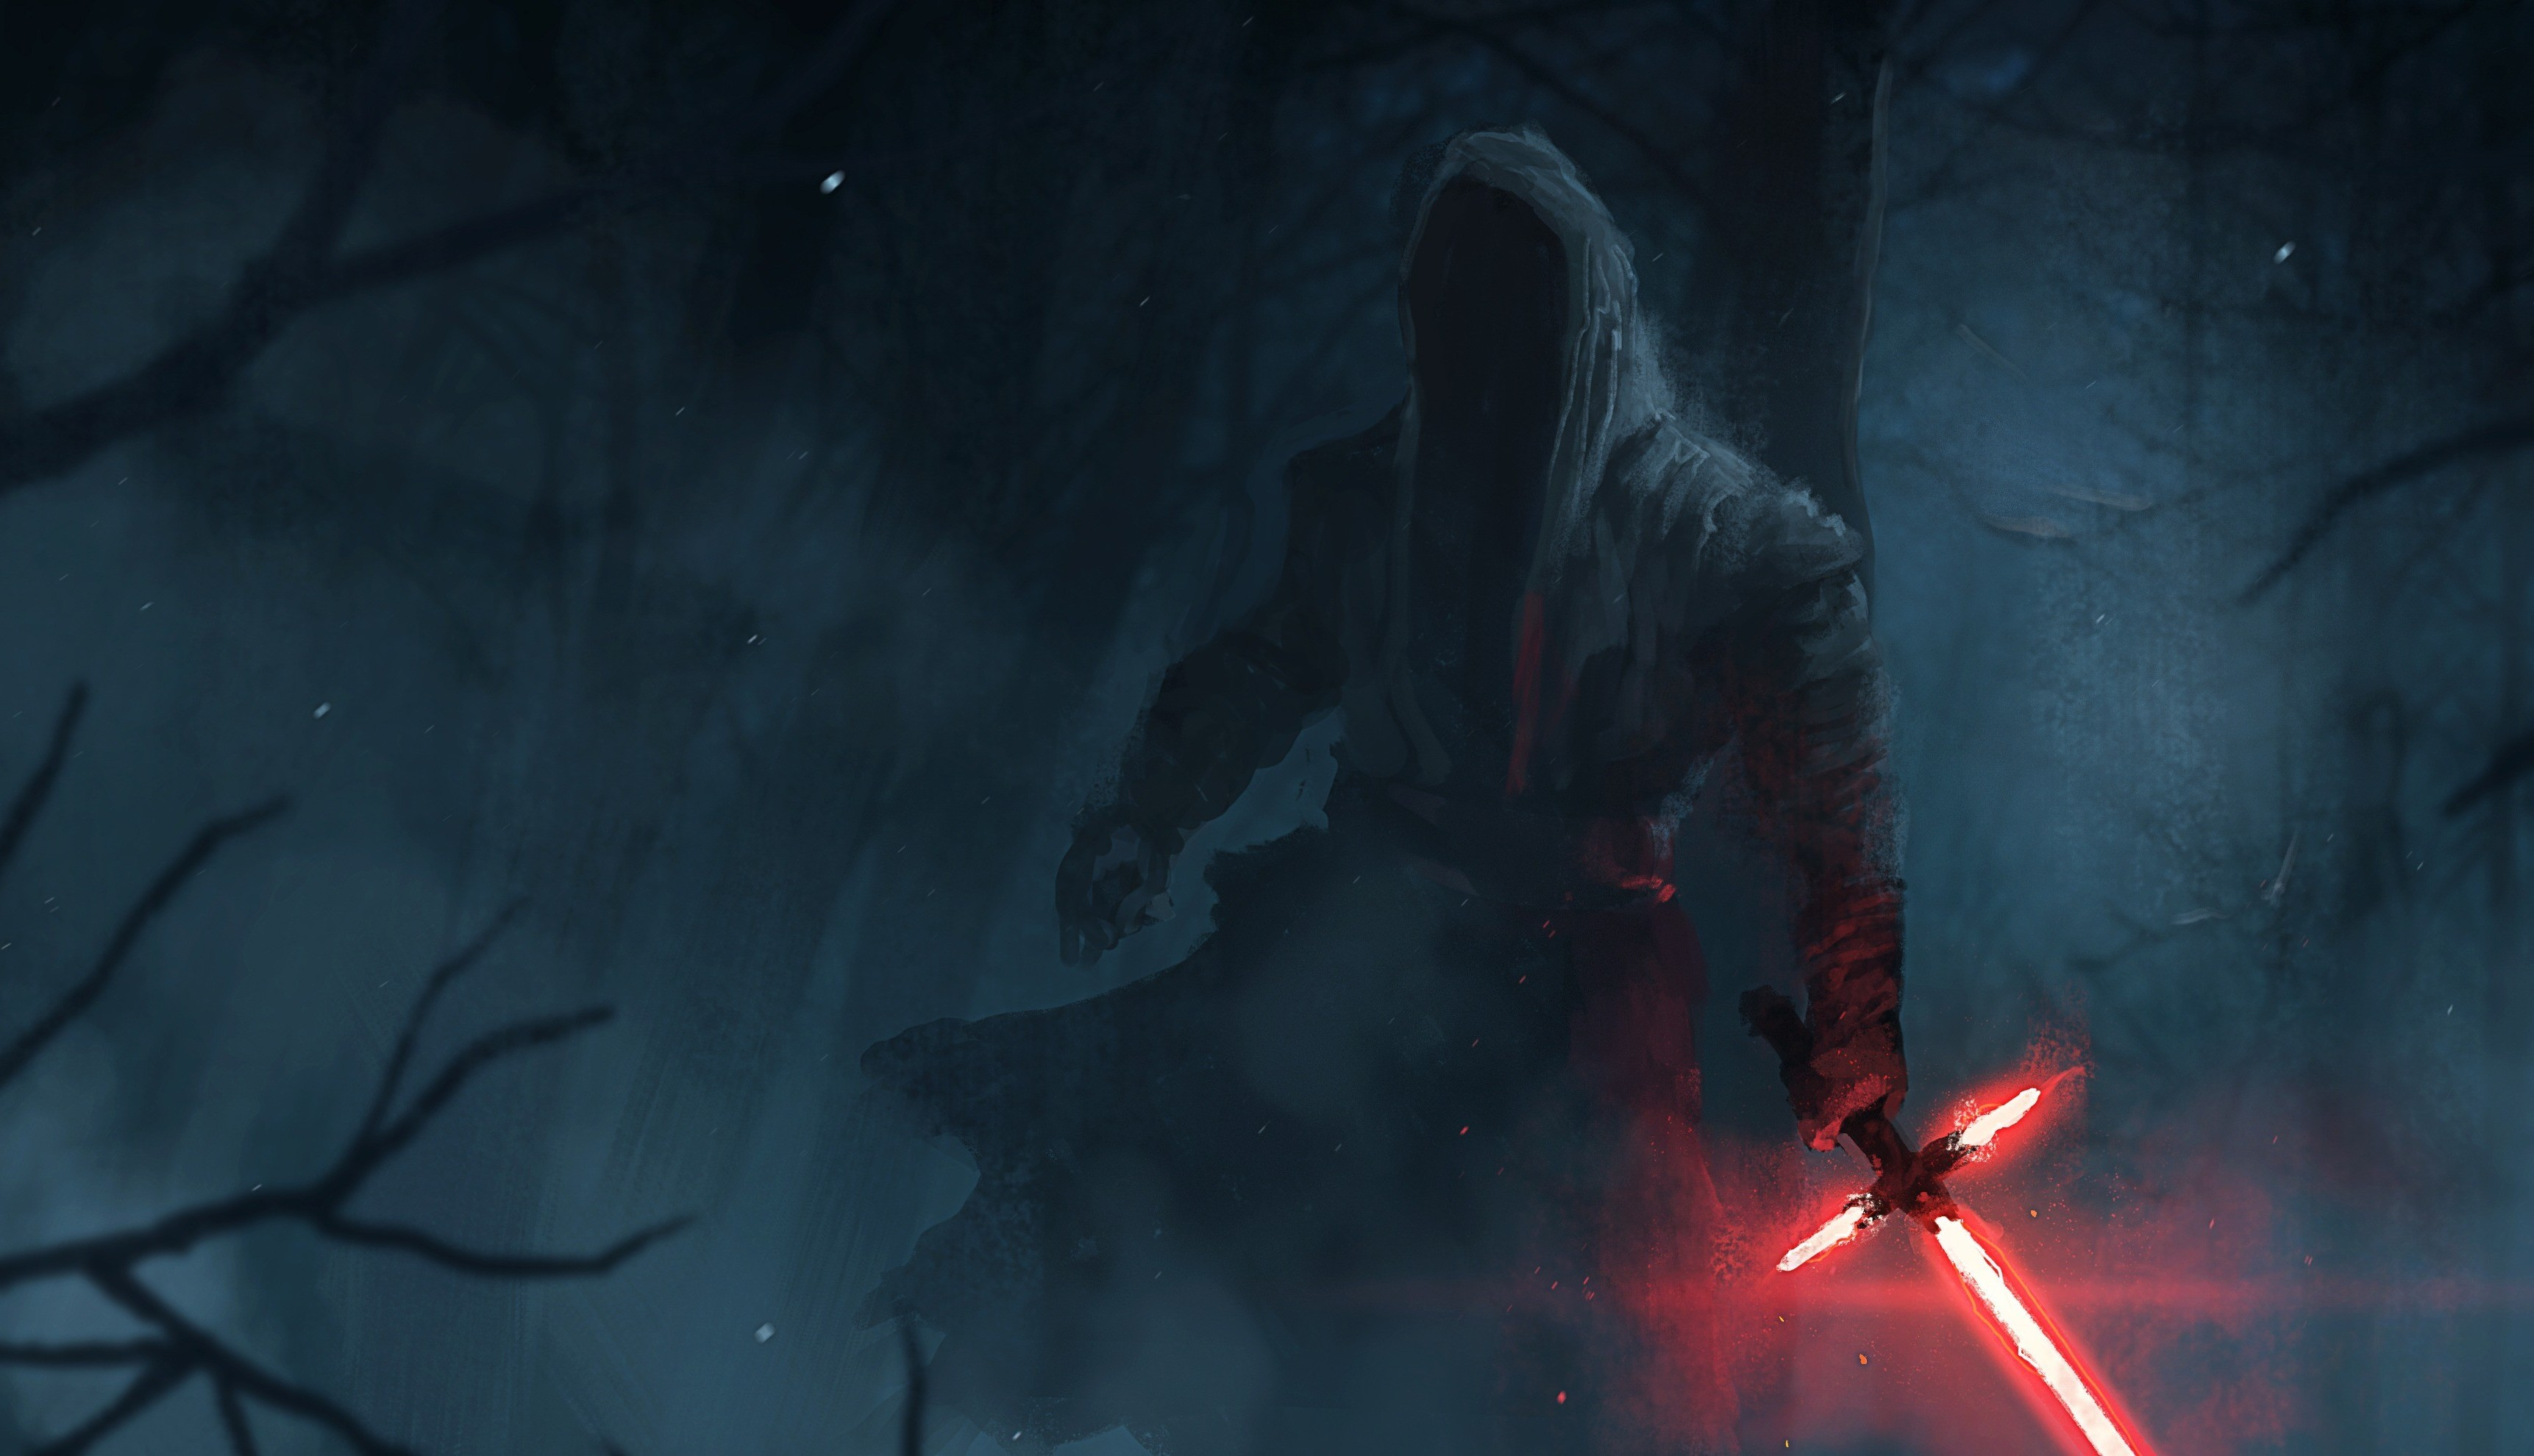 Kylo Ren Star Wars Star Wars The Force Awakens Lightsaber Wallpapers Hd Desktop And Mobile Backgrounds